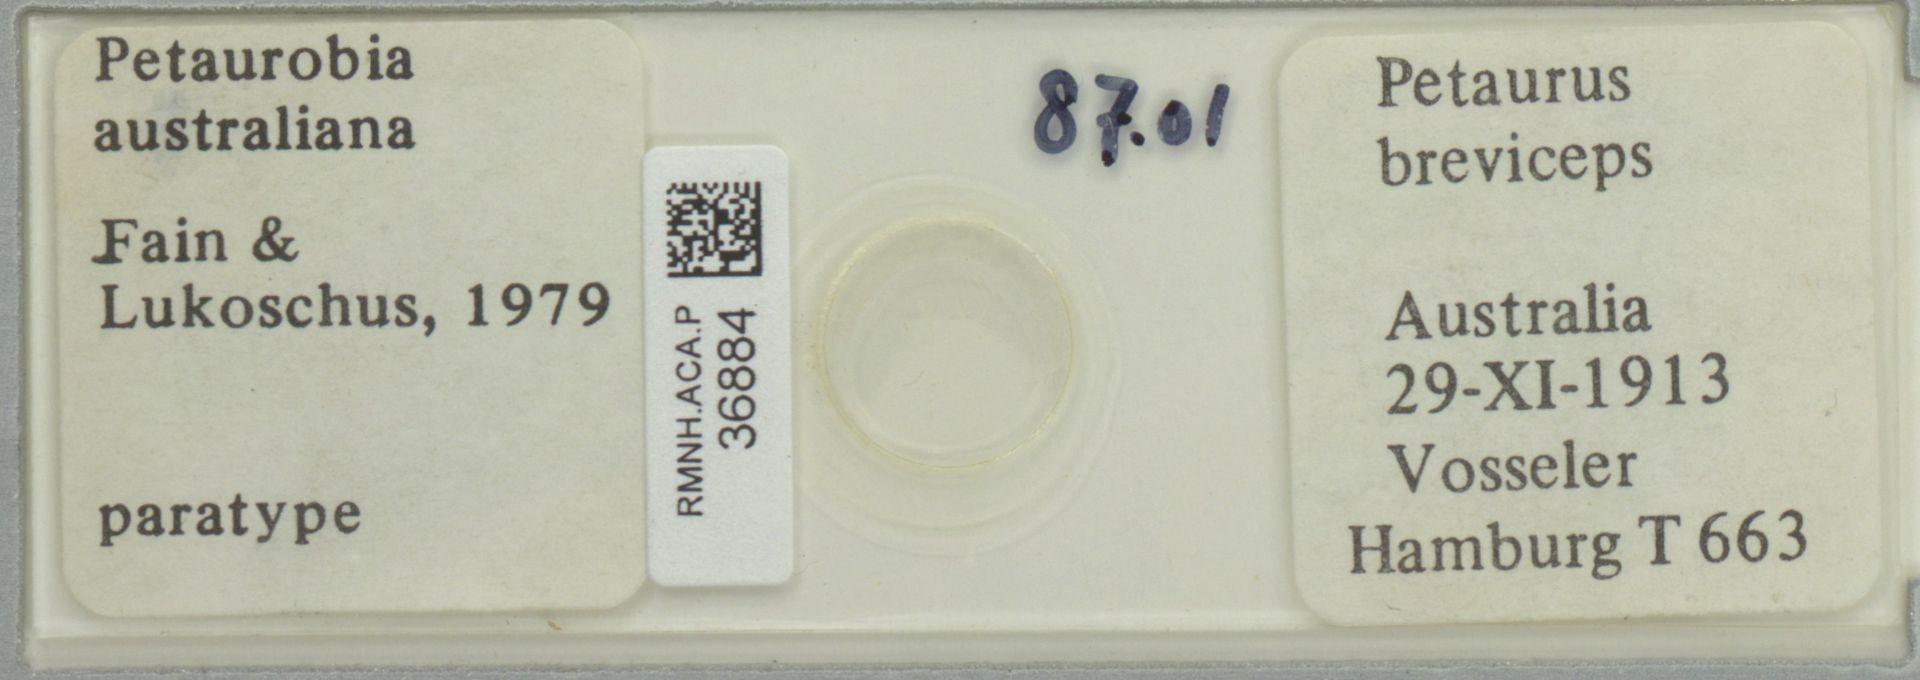 RMNH.ACA.P.36884 | Petaurobia australiana Fain & Lukoschus, 1979